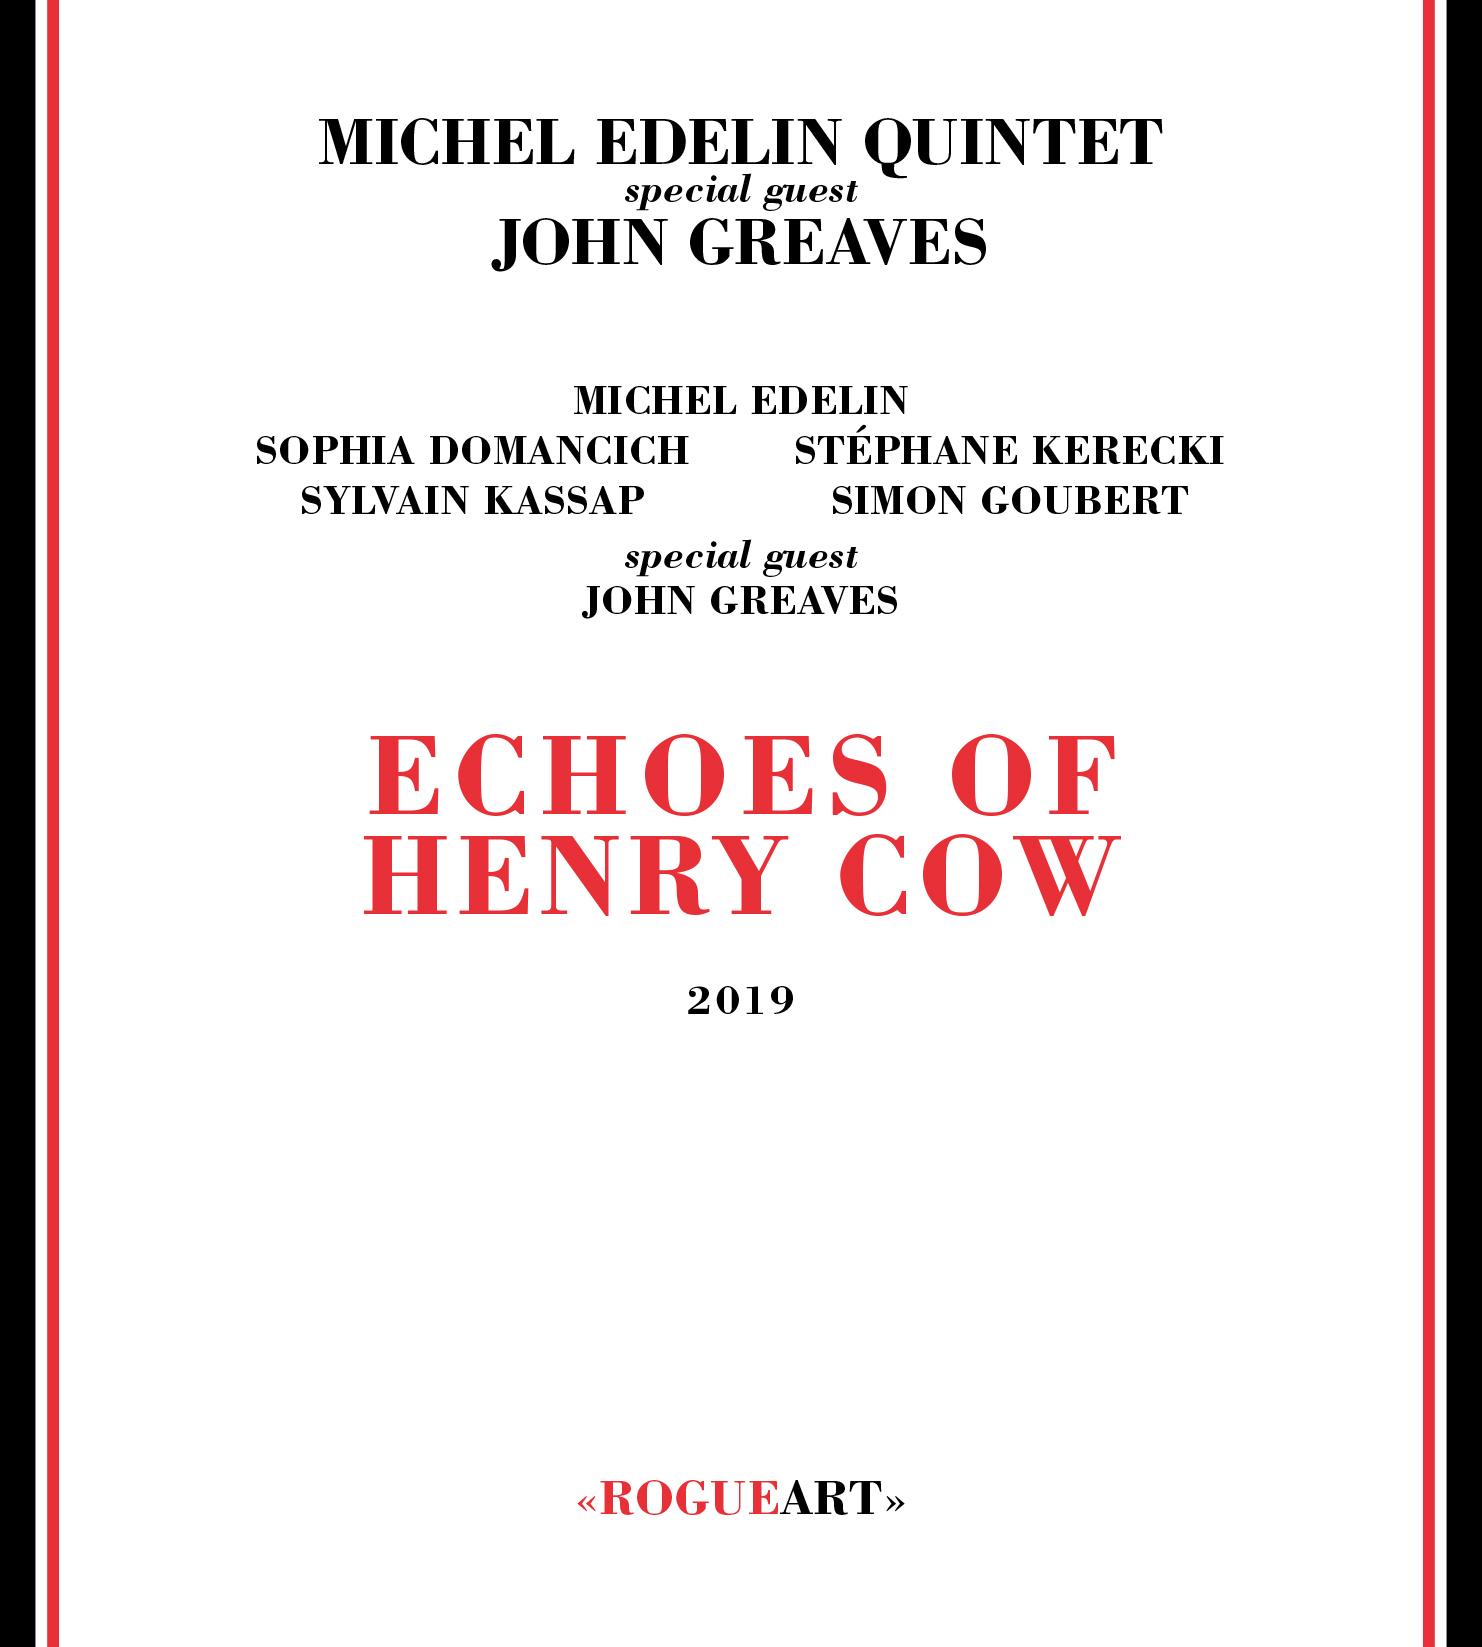 AMN Reviews: Michel Edelin Quintet – Echoes of Henry Cow (2019; Rogue Art)